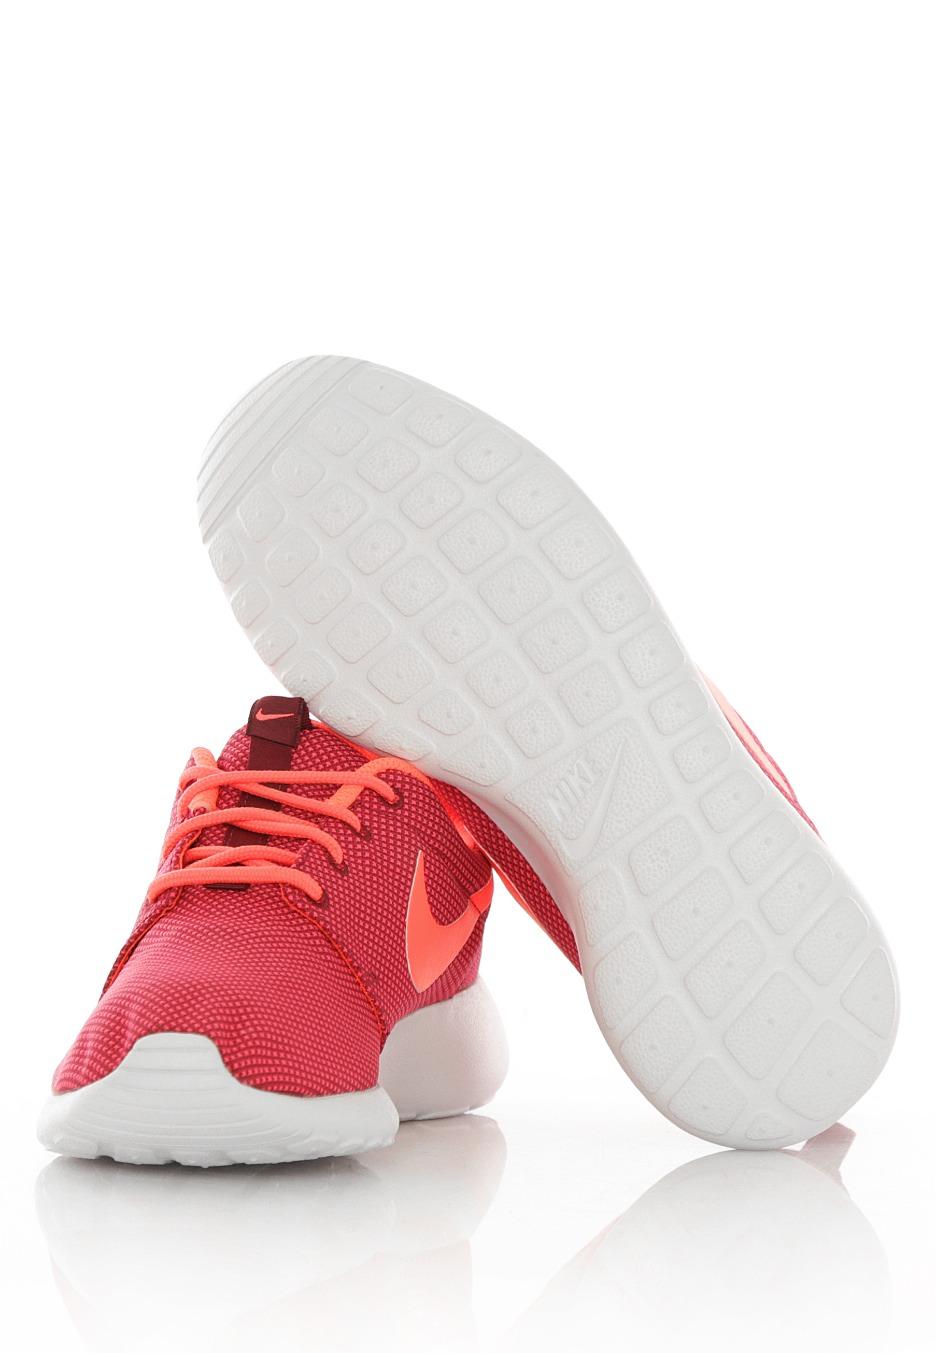 4ecf8c6d328b ... Nike - Roshe One Deep Garnet Bright Crimson Pure Platinum - Girl Shoes  ...